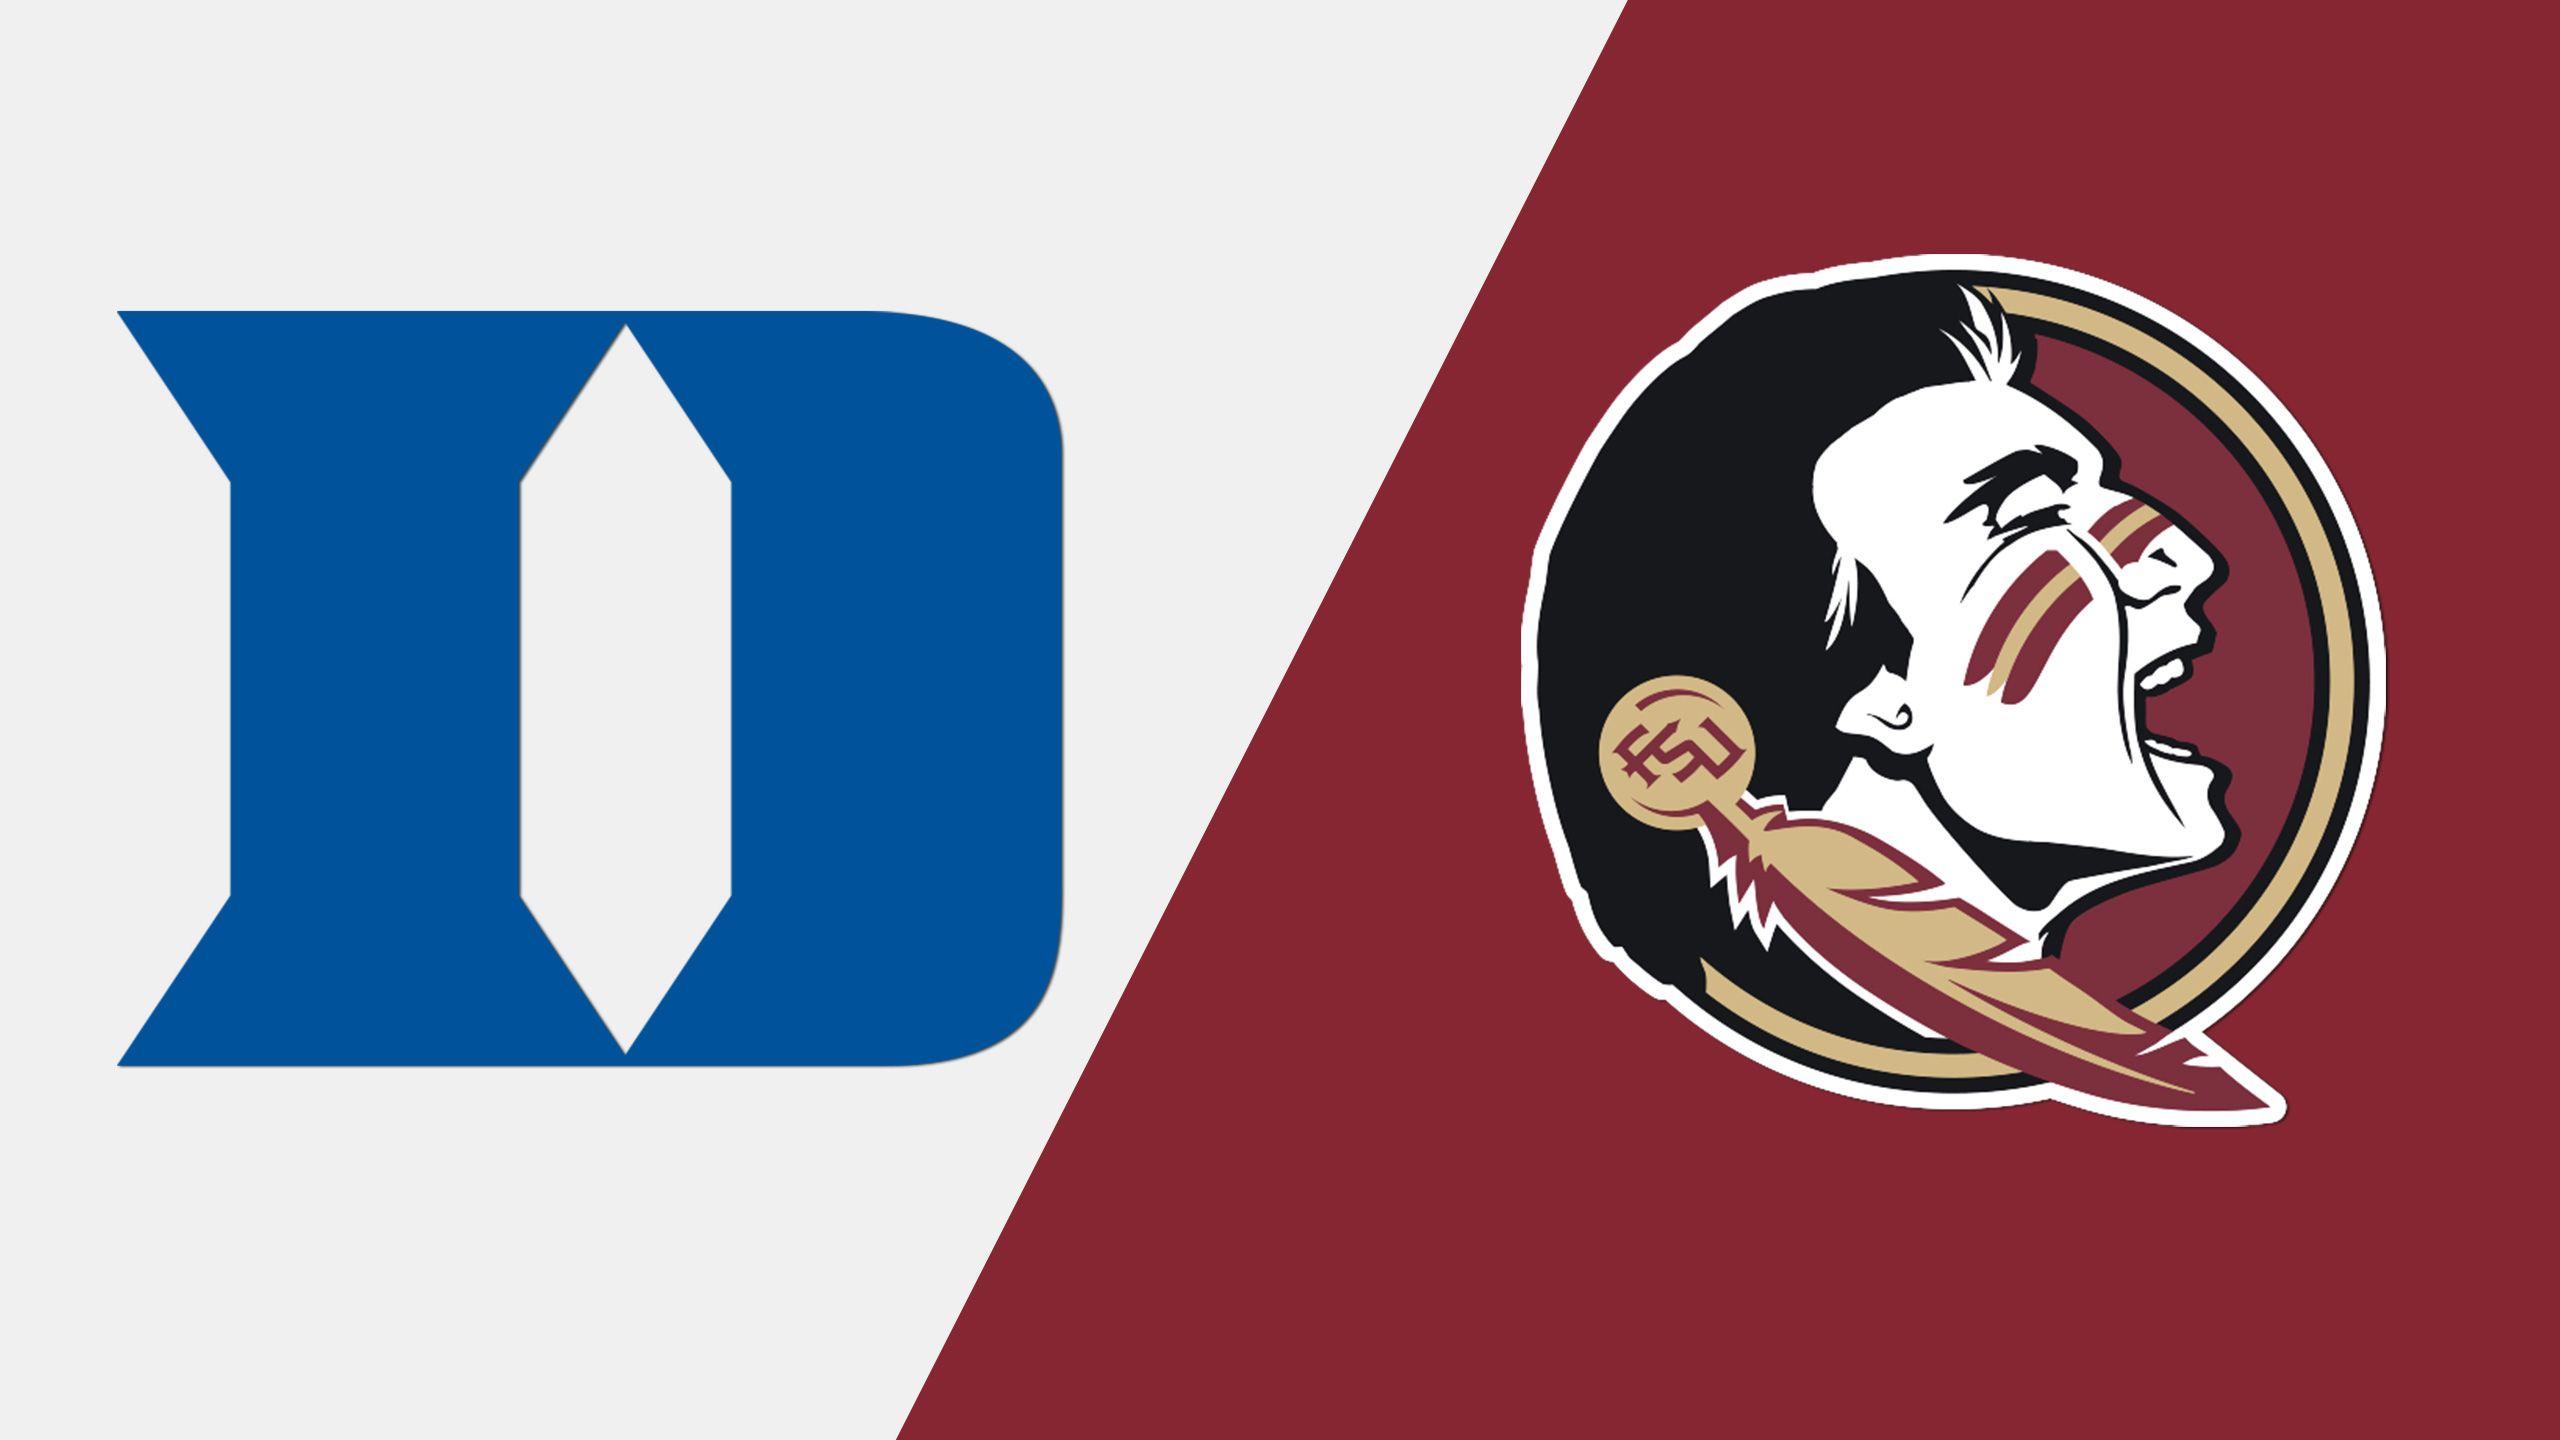 #12 Duke vs. #10 Florida State (Baseball)